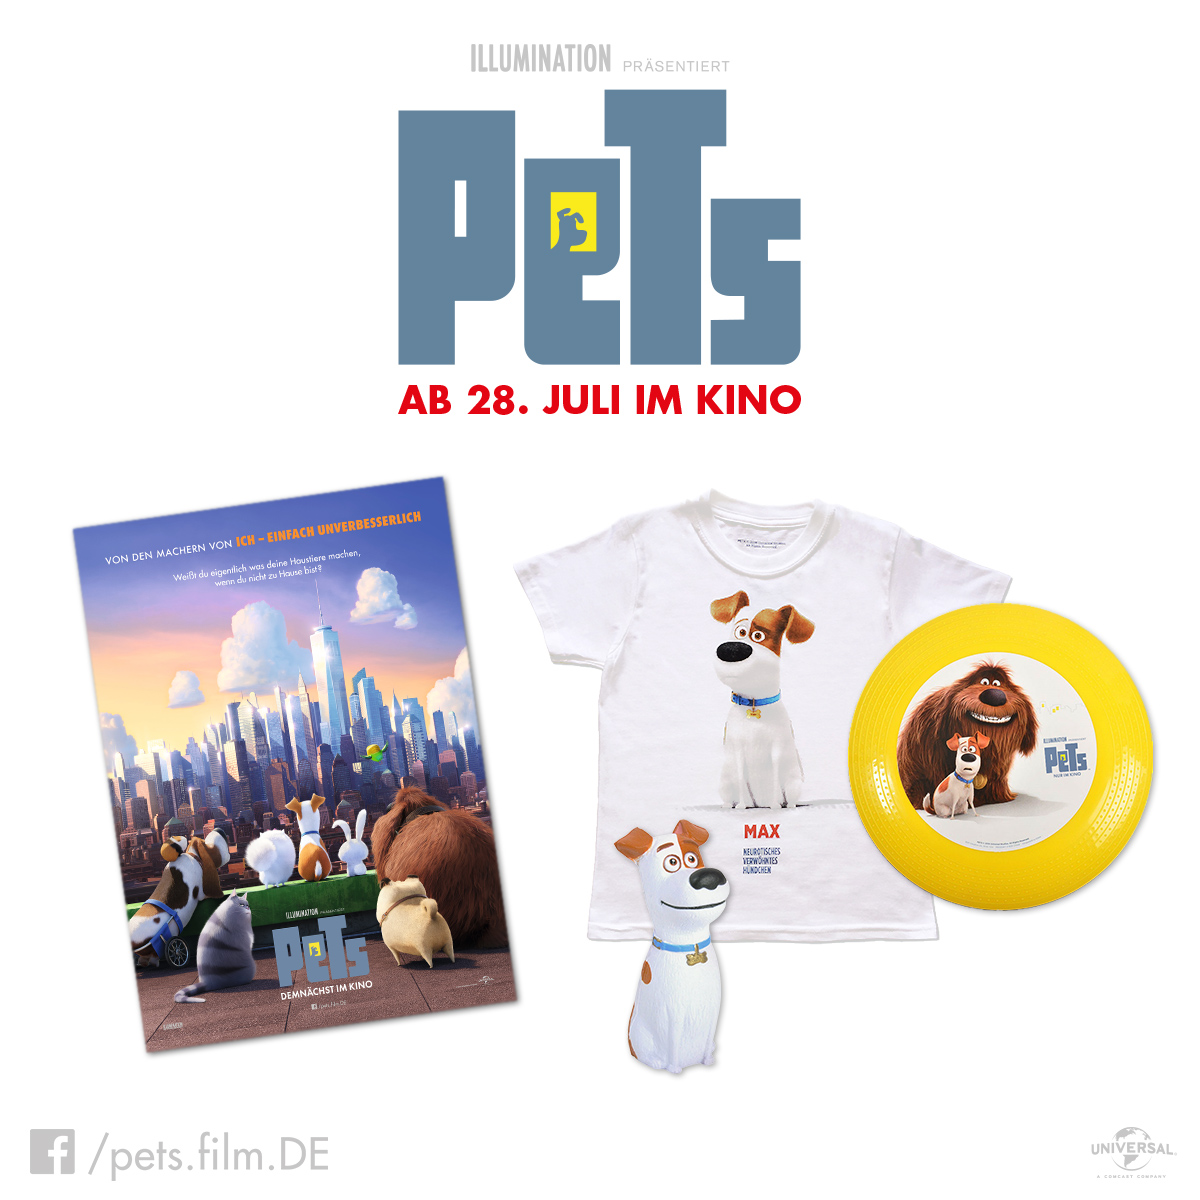 Pets Gewinnspiel - Pets Filmvorstellung & Gewinnspiel